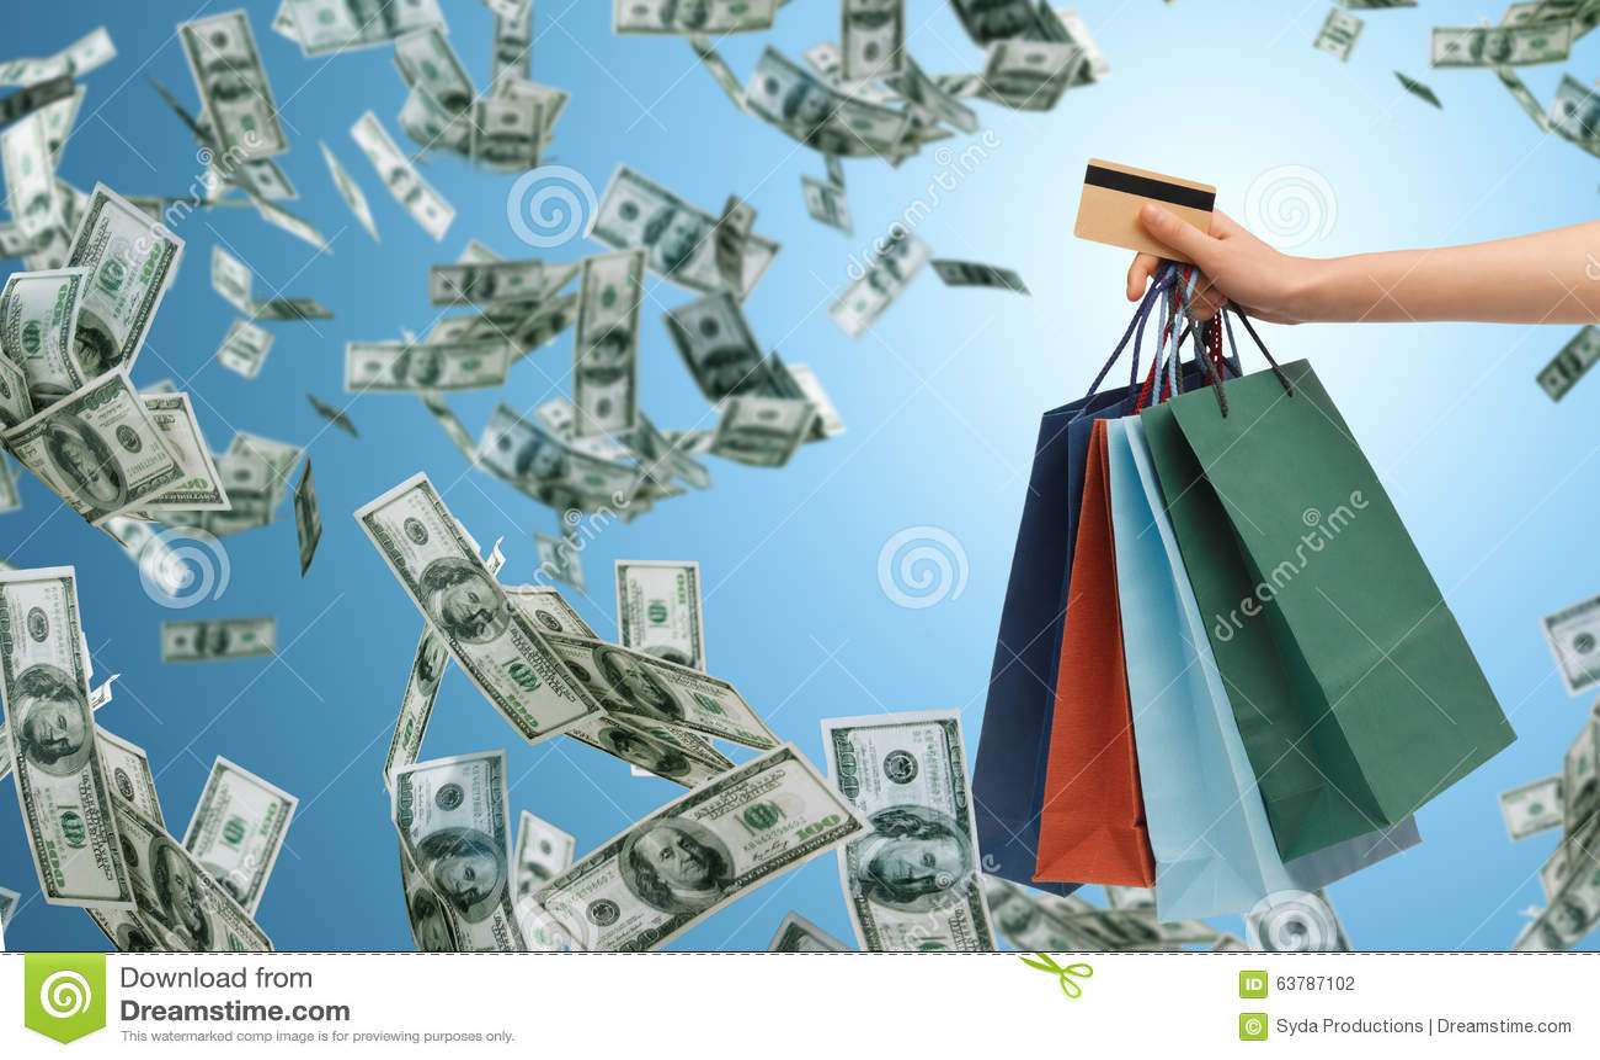 how to close travel money card